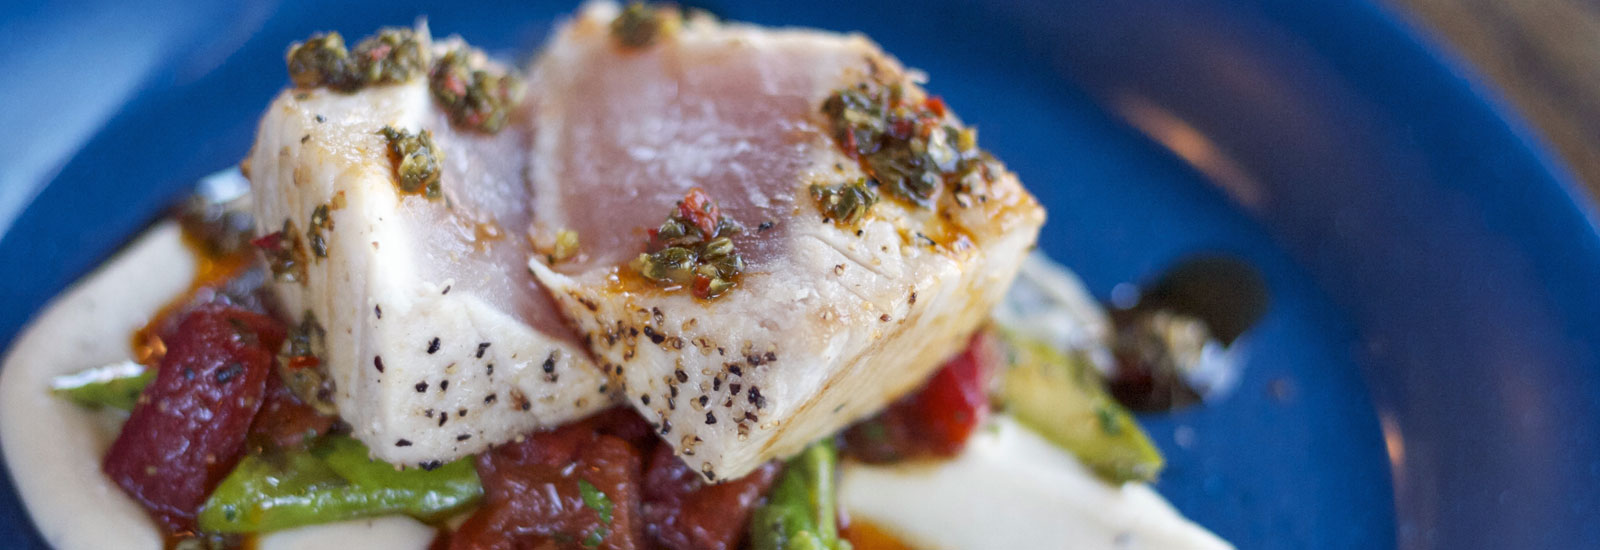 slider-fish-bar-market-fish-tuna.jpg